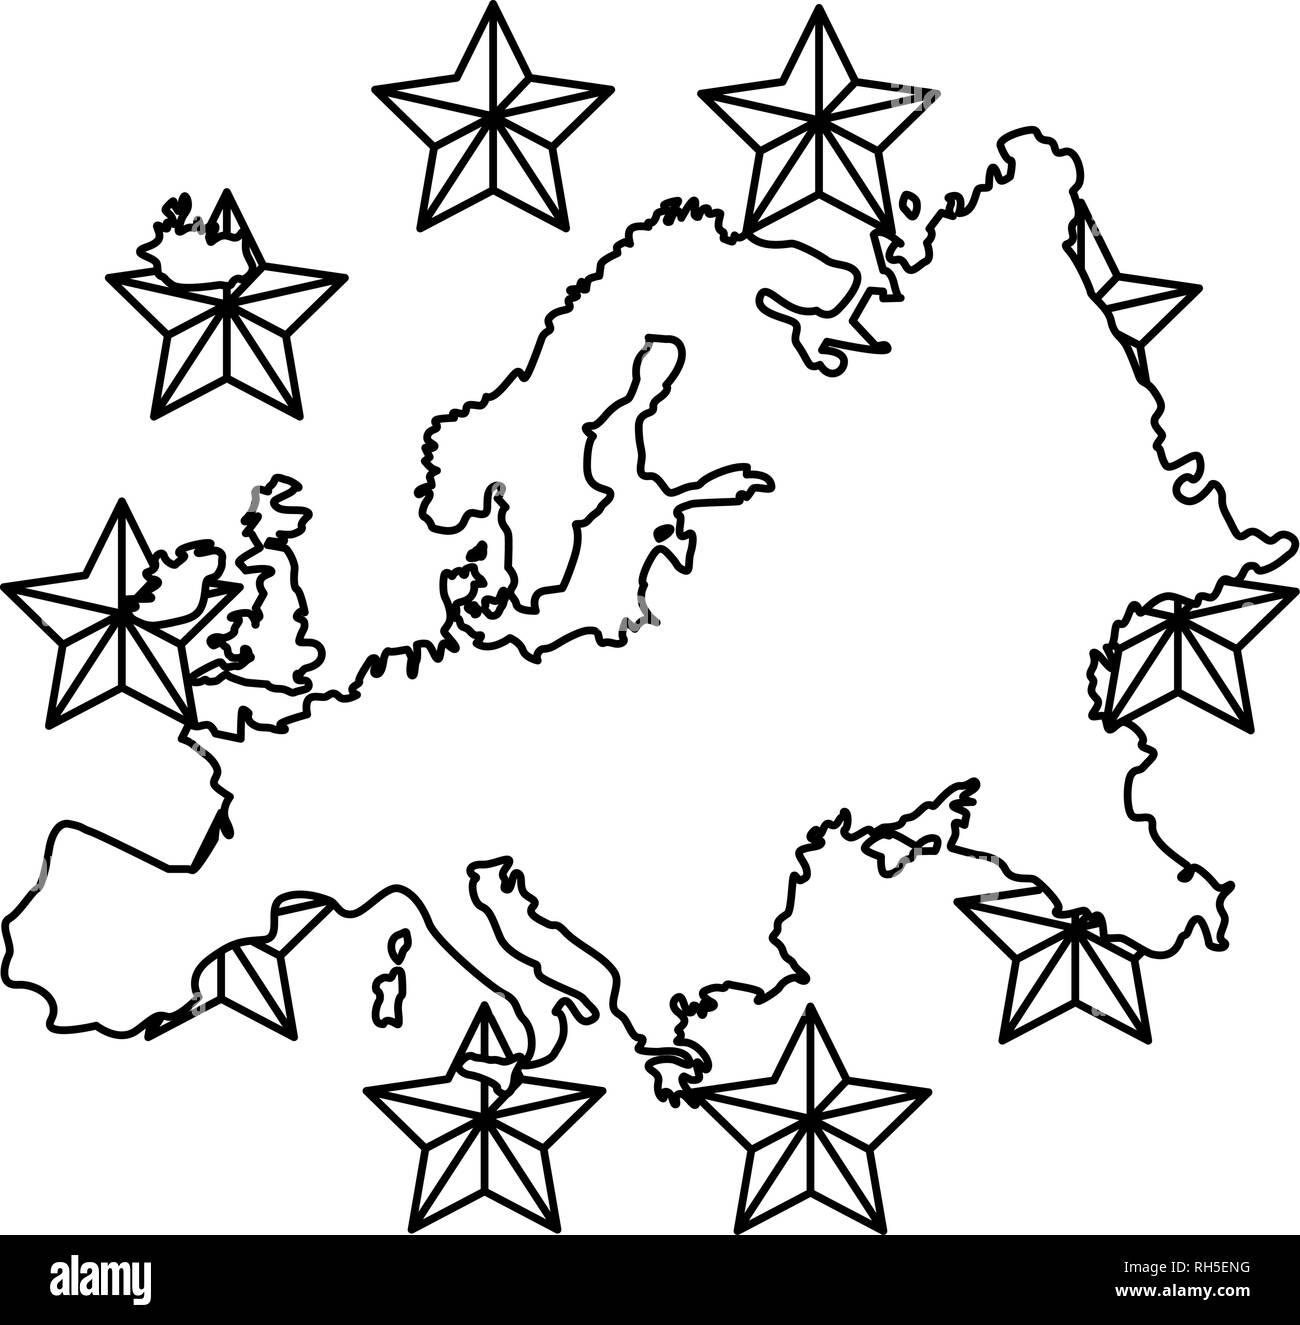 european union copyright of intellectual vector illustration - Stock Image